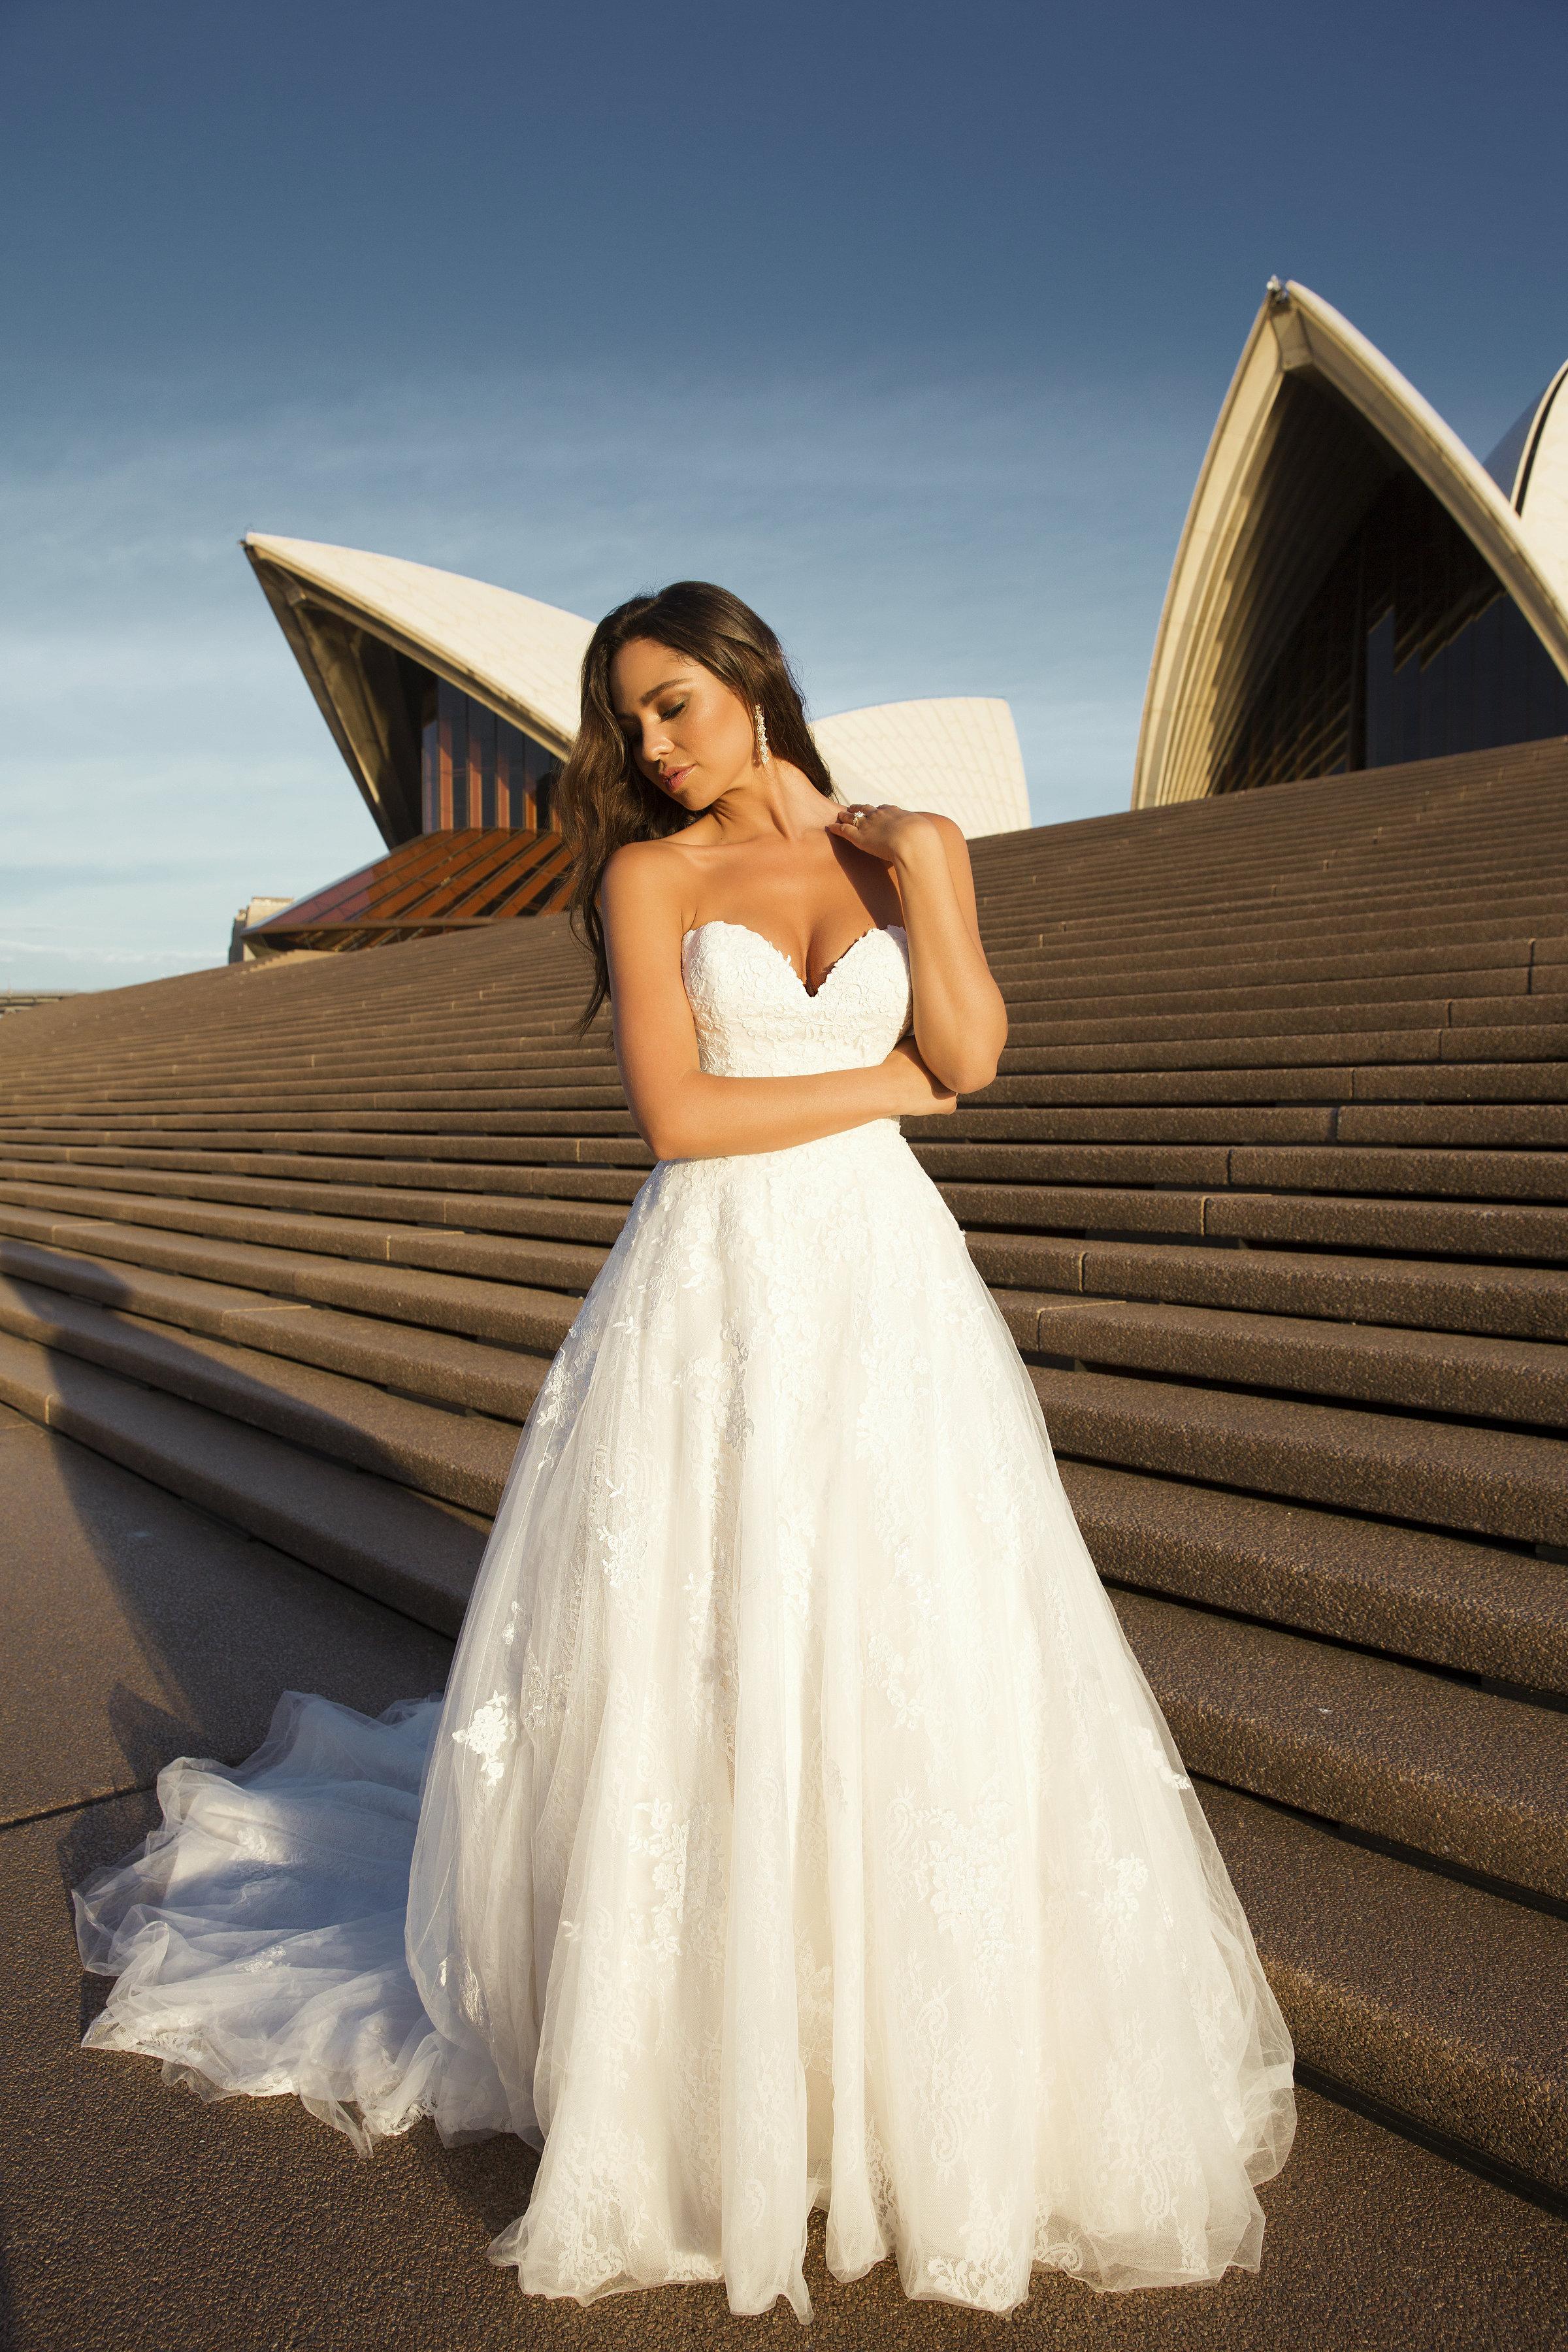 43859d25e1b M1821Z Penn strapless sweetheart cathedral train lace tulle wedding dress  mia solano luv bridal australia